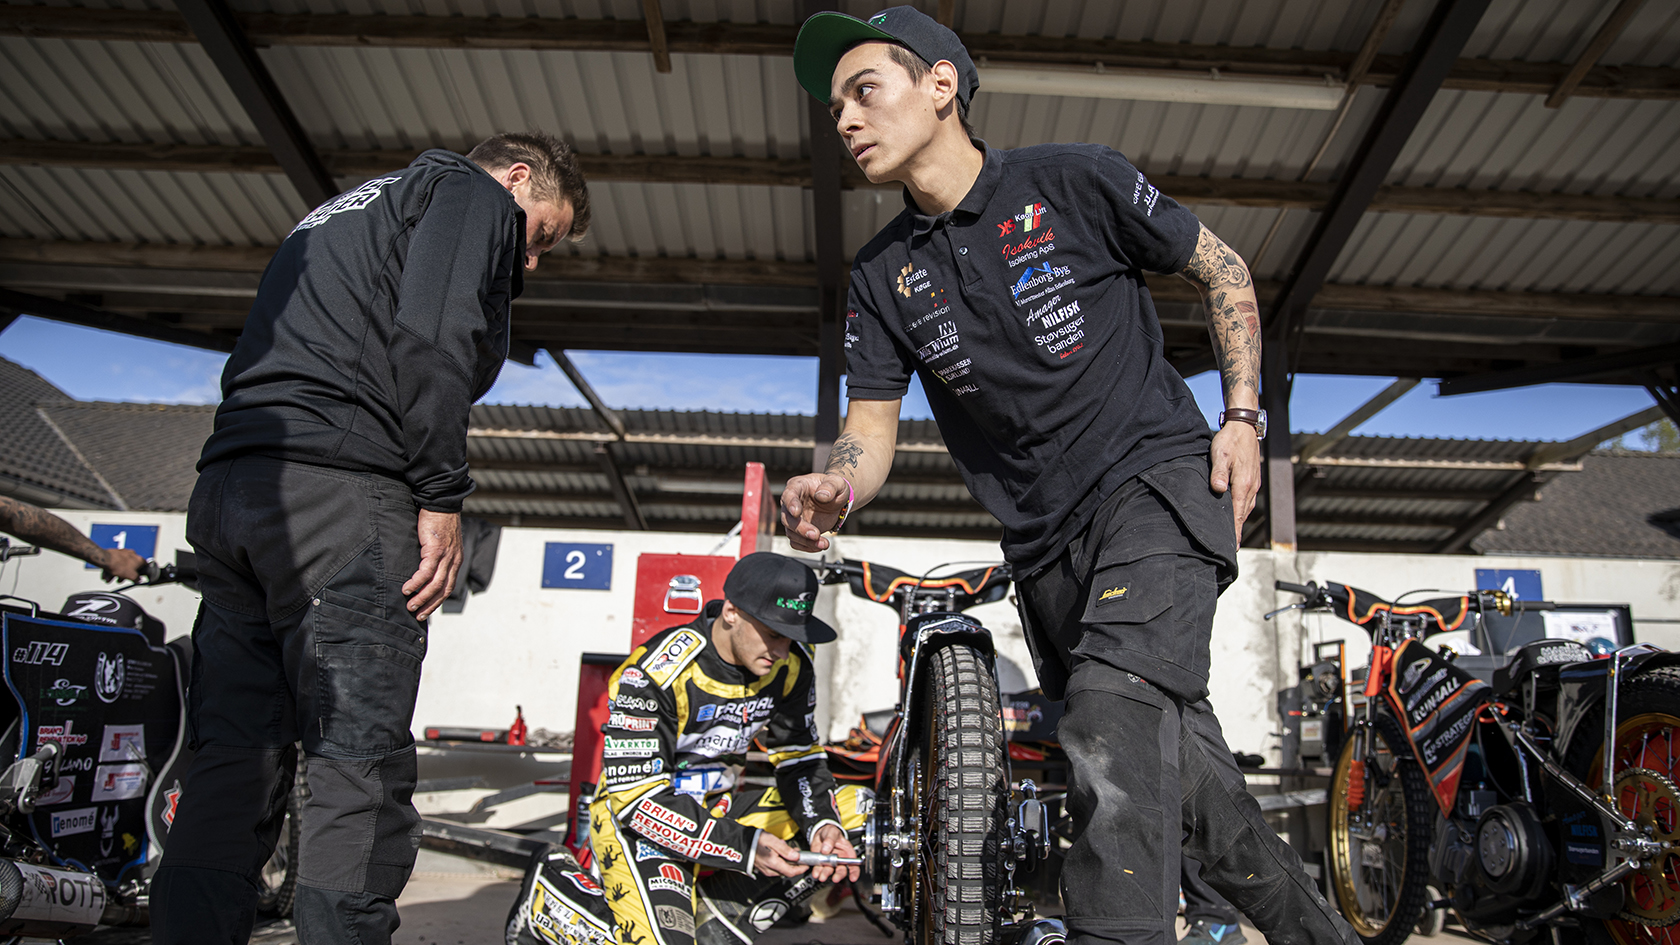 Kim Christensen er mekaniker for speedwaykøreren Marius Nielsen, der kører på Slangerups hold.